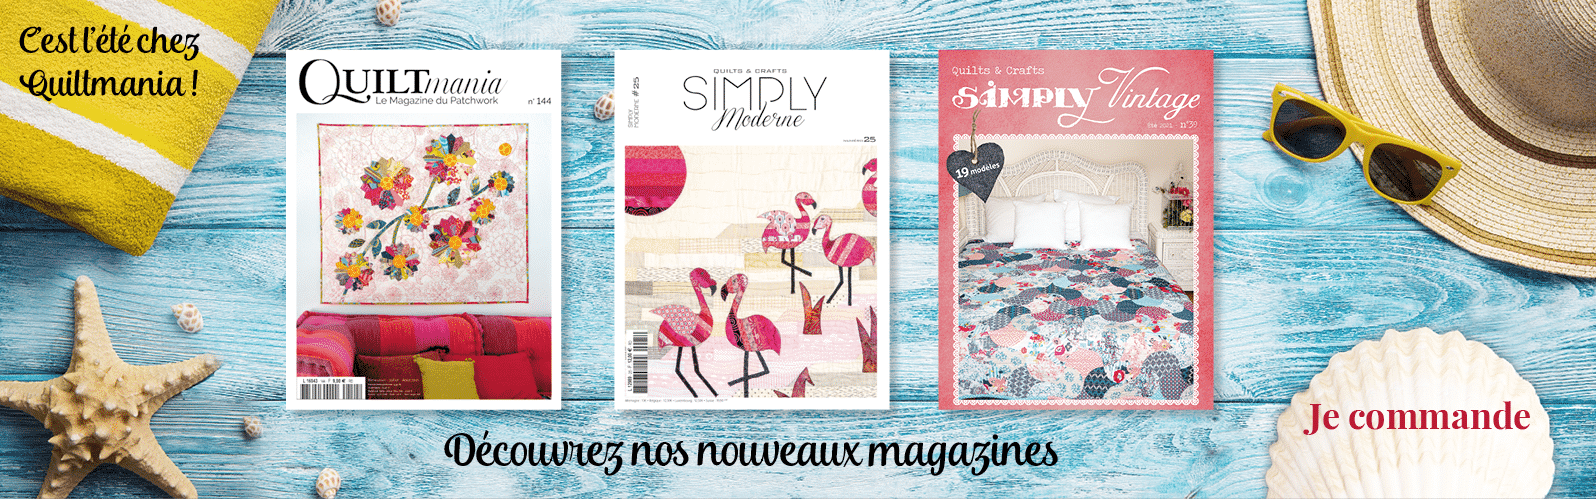 Magazines d'été 2021